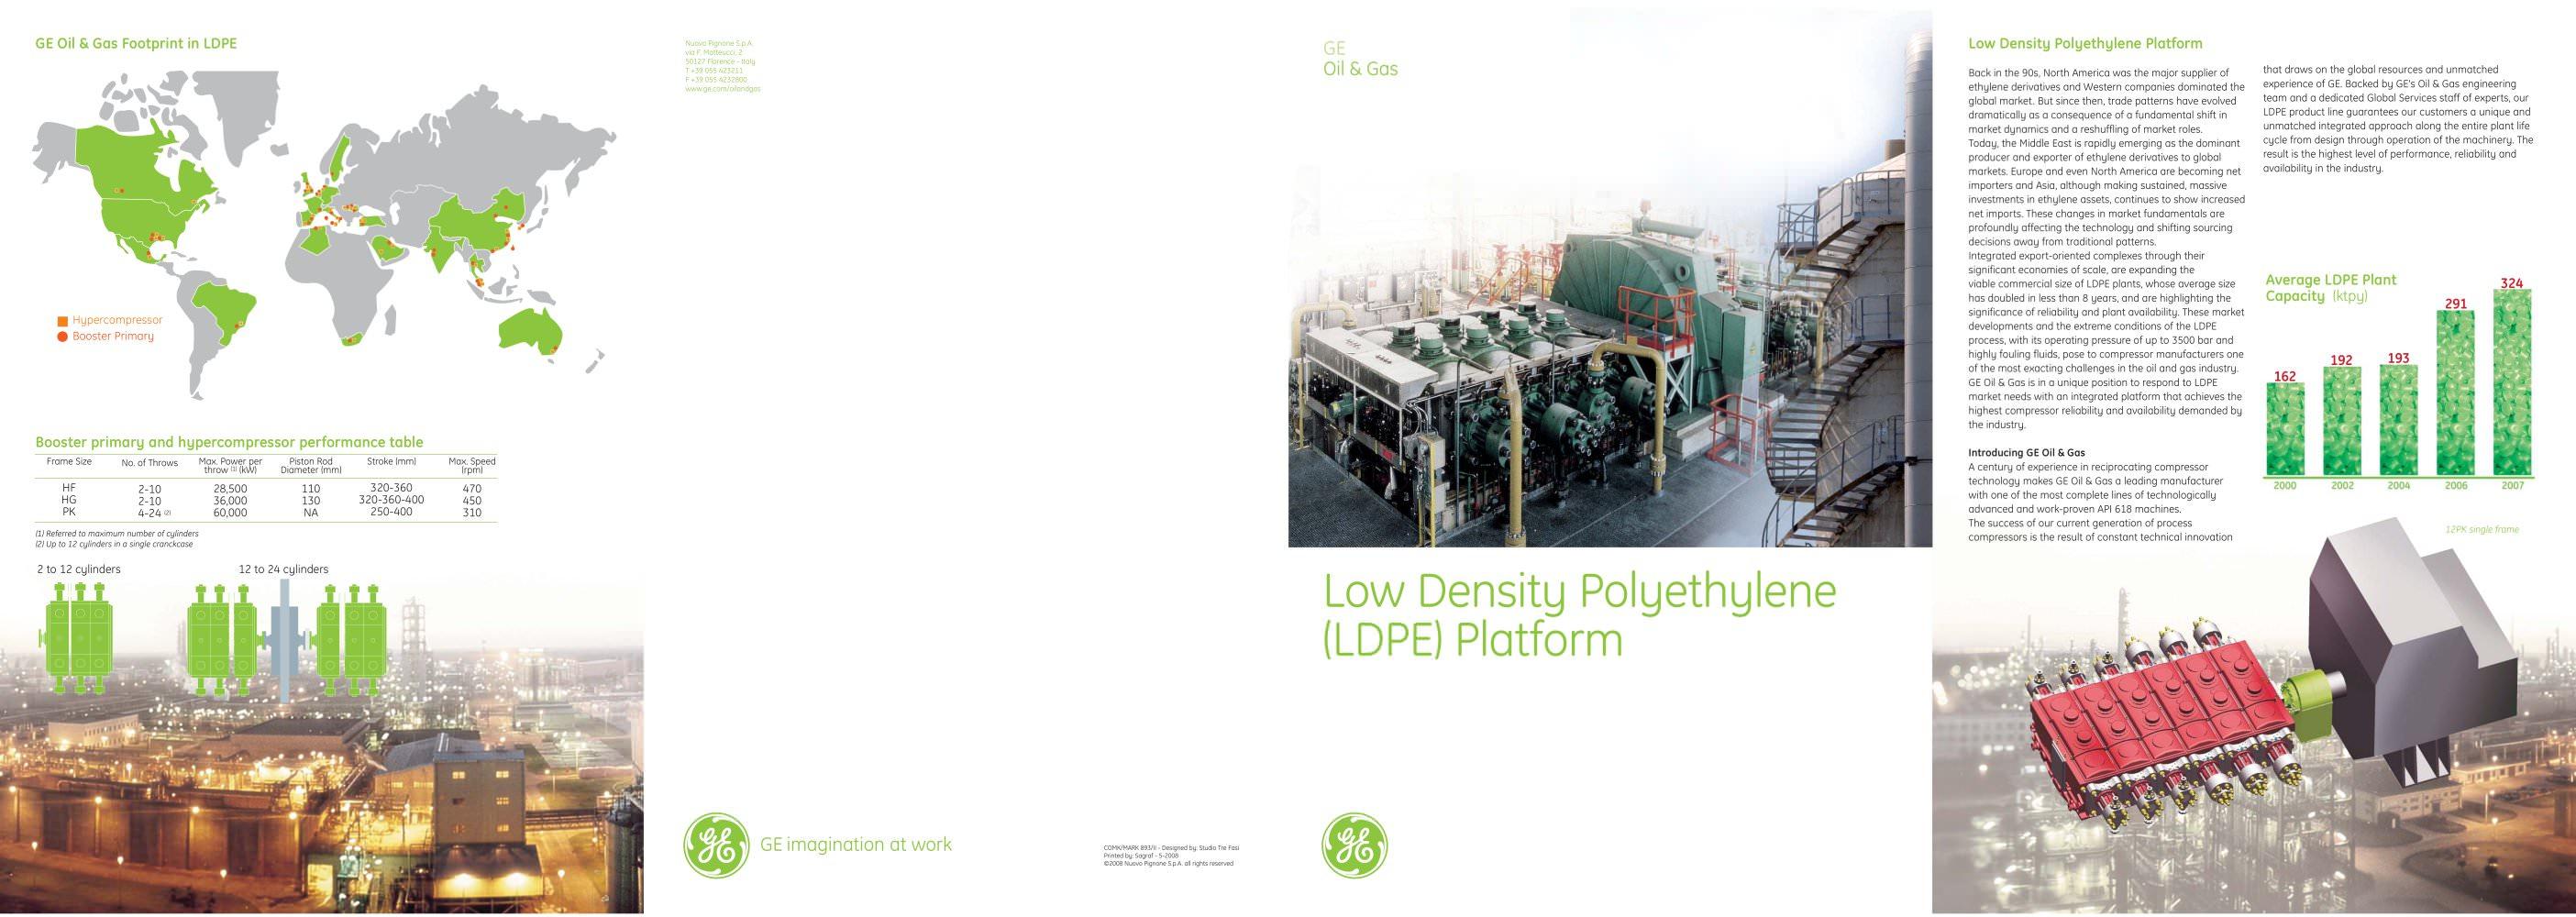 Low Density Polyethylene LDPE Platform GE pressors PDF